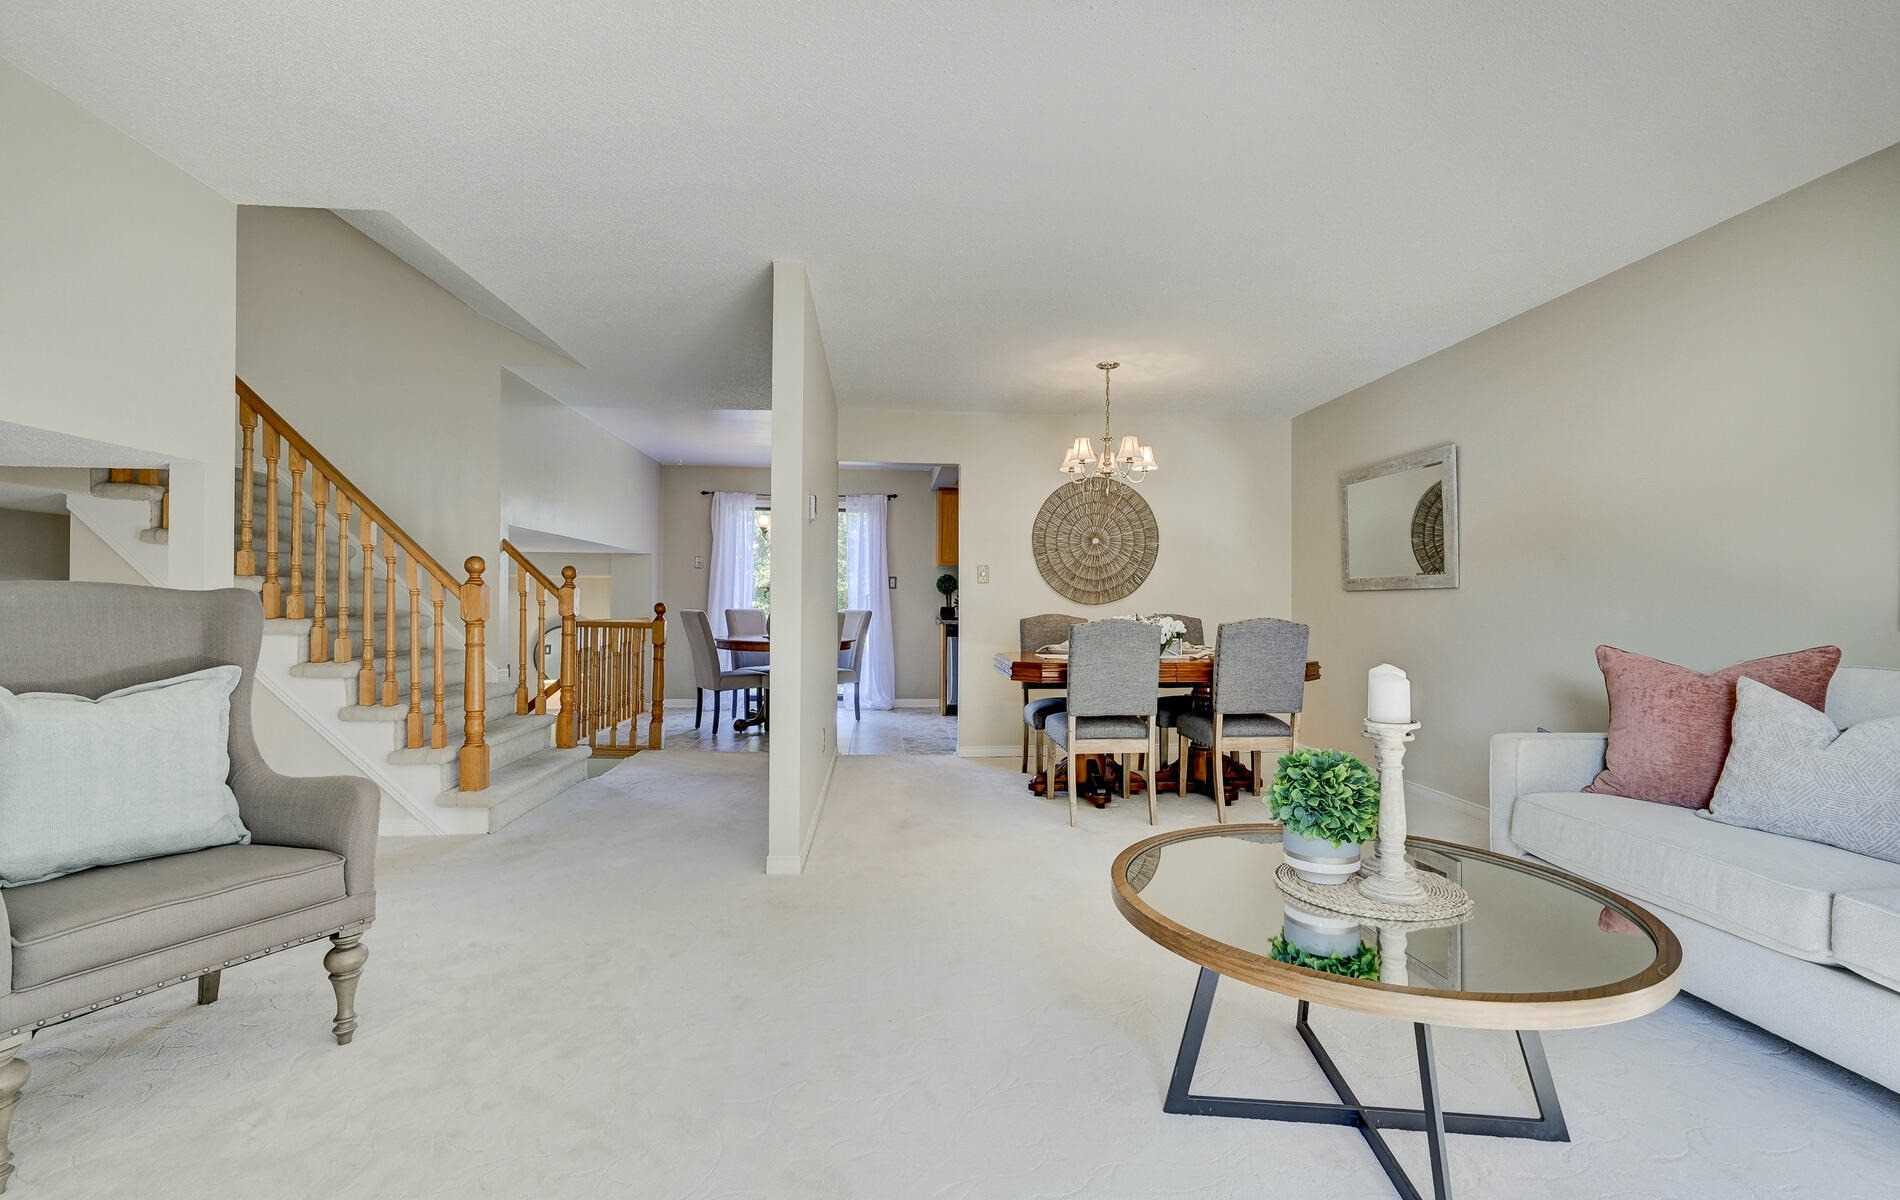 31 Kenyon Crt, Whitby, Ontario L1N8T3, 3 Bedrooms Bedrooms, 8 Rooms Rooms,3 BathroomsBathrooms,Detached,For Sale,Kenyon,E5350956